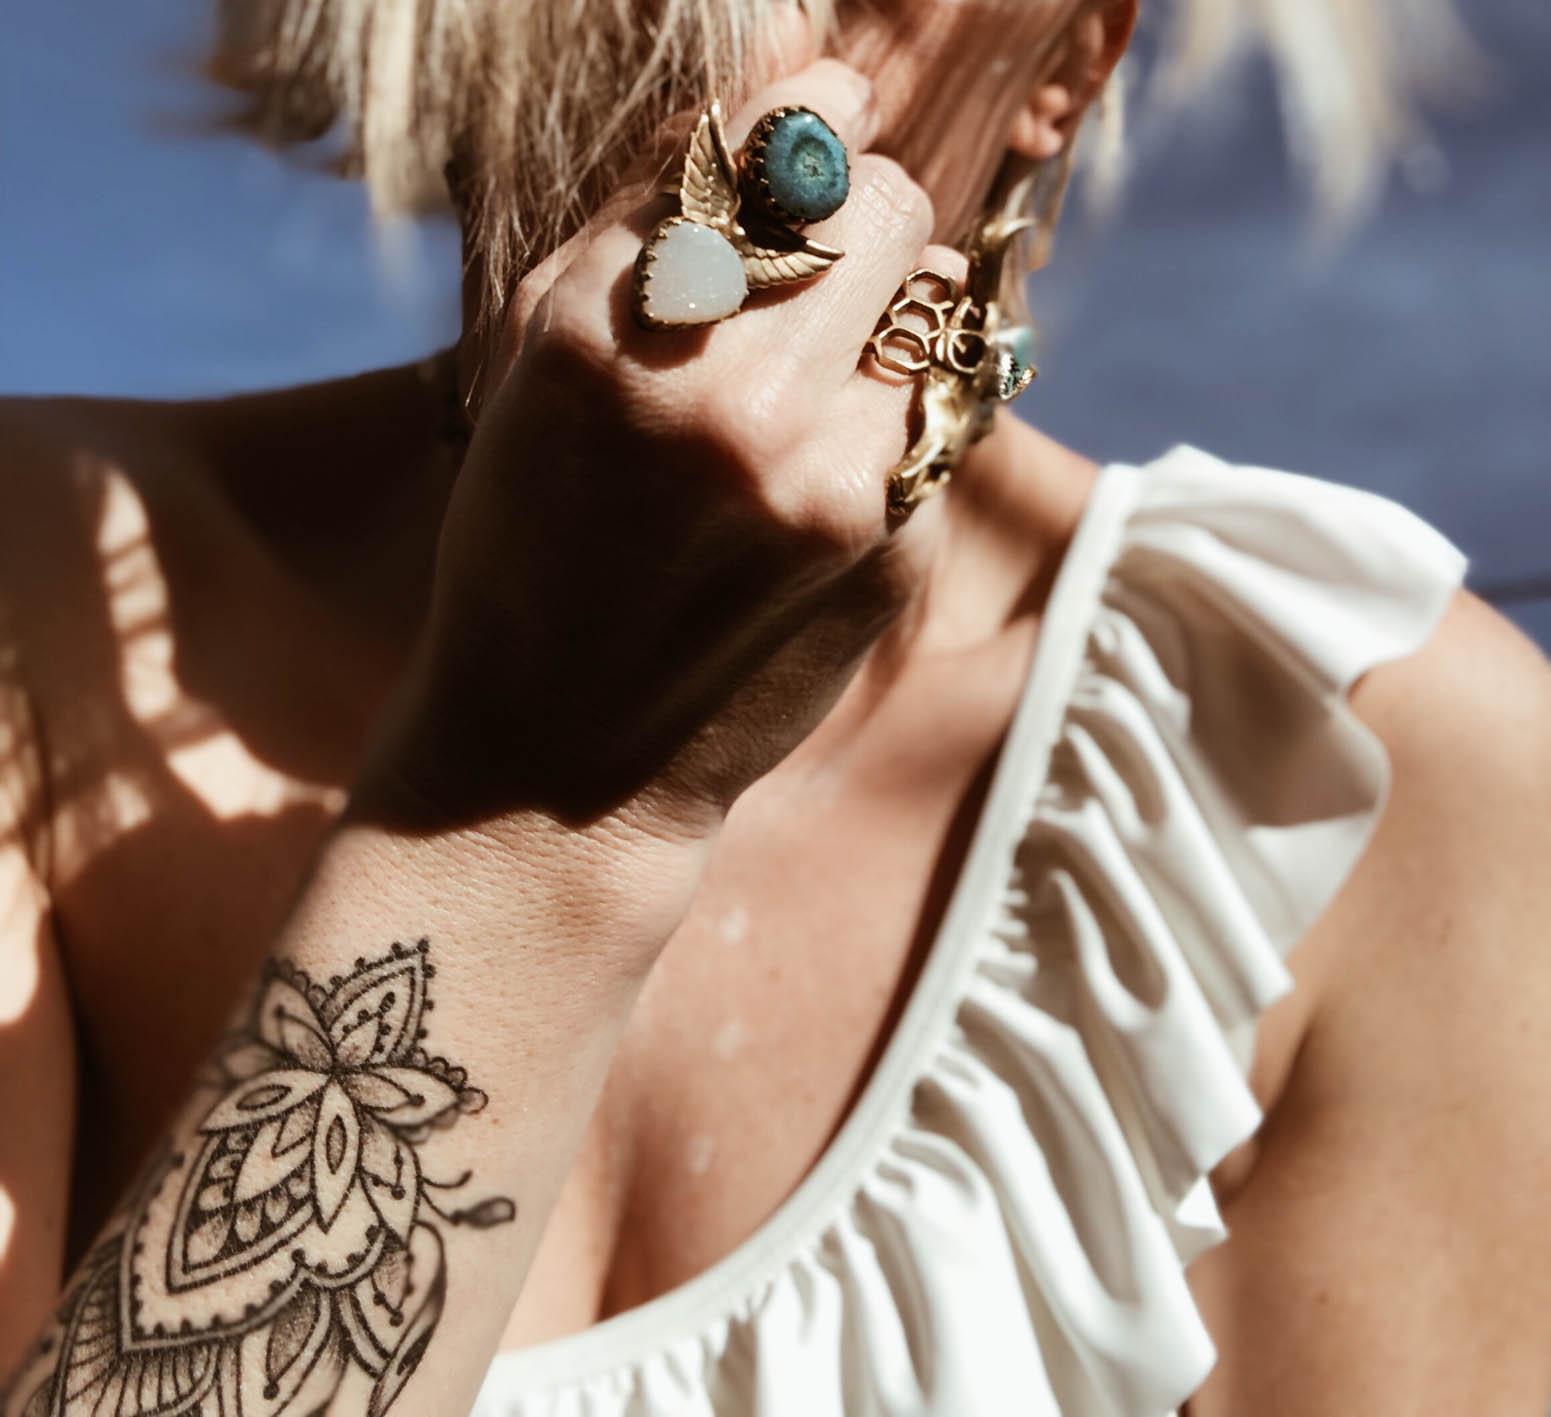 Carnet sauvage- blog mode et tendances - christina rose jewelry43.jpg